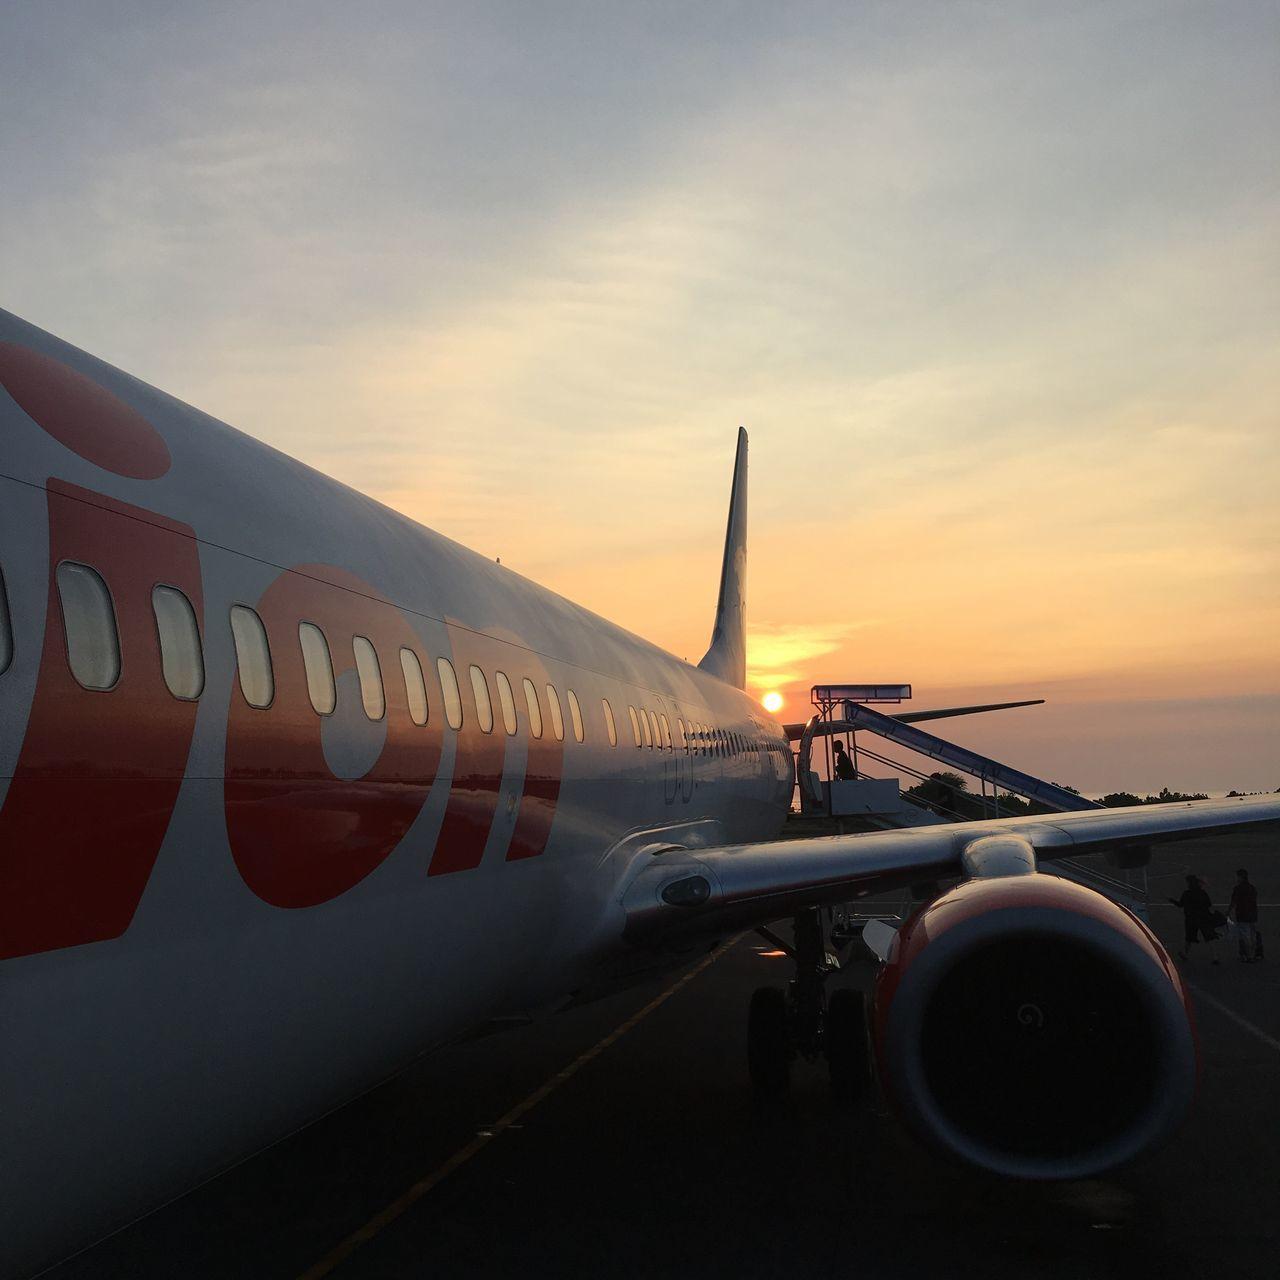 Sunset Transportation Airplane Mode Of Transport Part Of Sun Air Vehicle Sky Orange Color Flying Journey Outdoors Cloud - Sky Sunbeam Scenics Back Lit Tranquil Scene bye bali Bye Bali